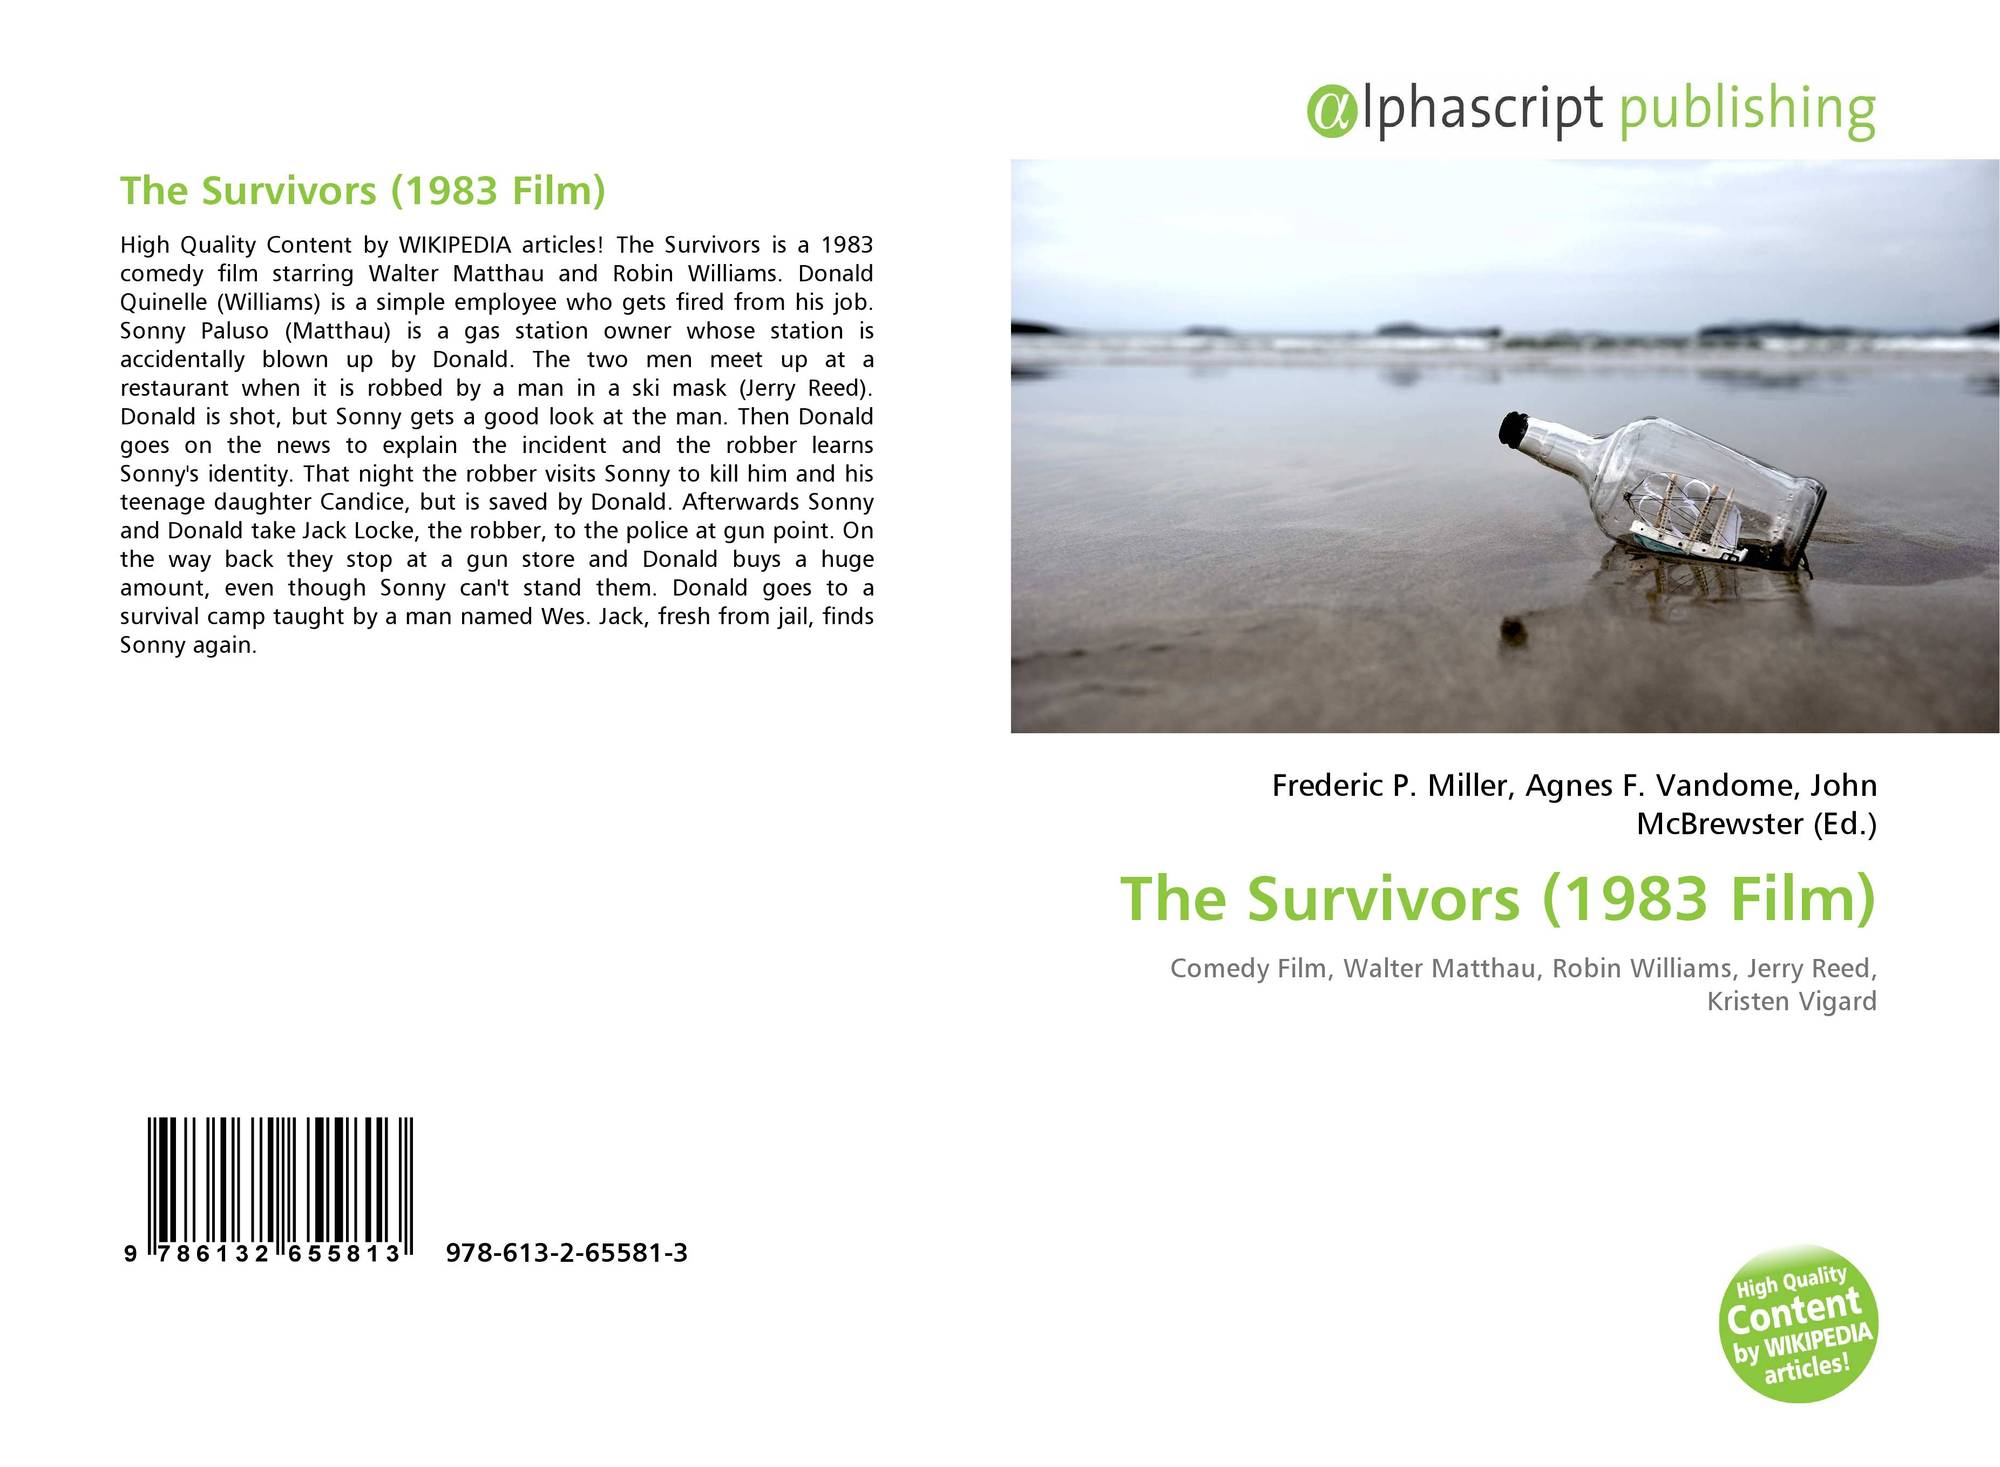 The Survivors (1983 Film), 978-613-2-65581-3, 6132655816